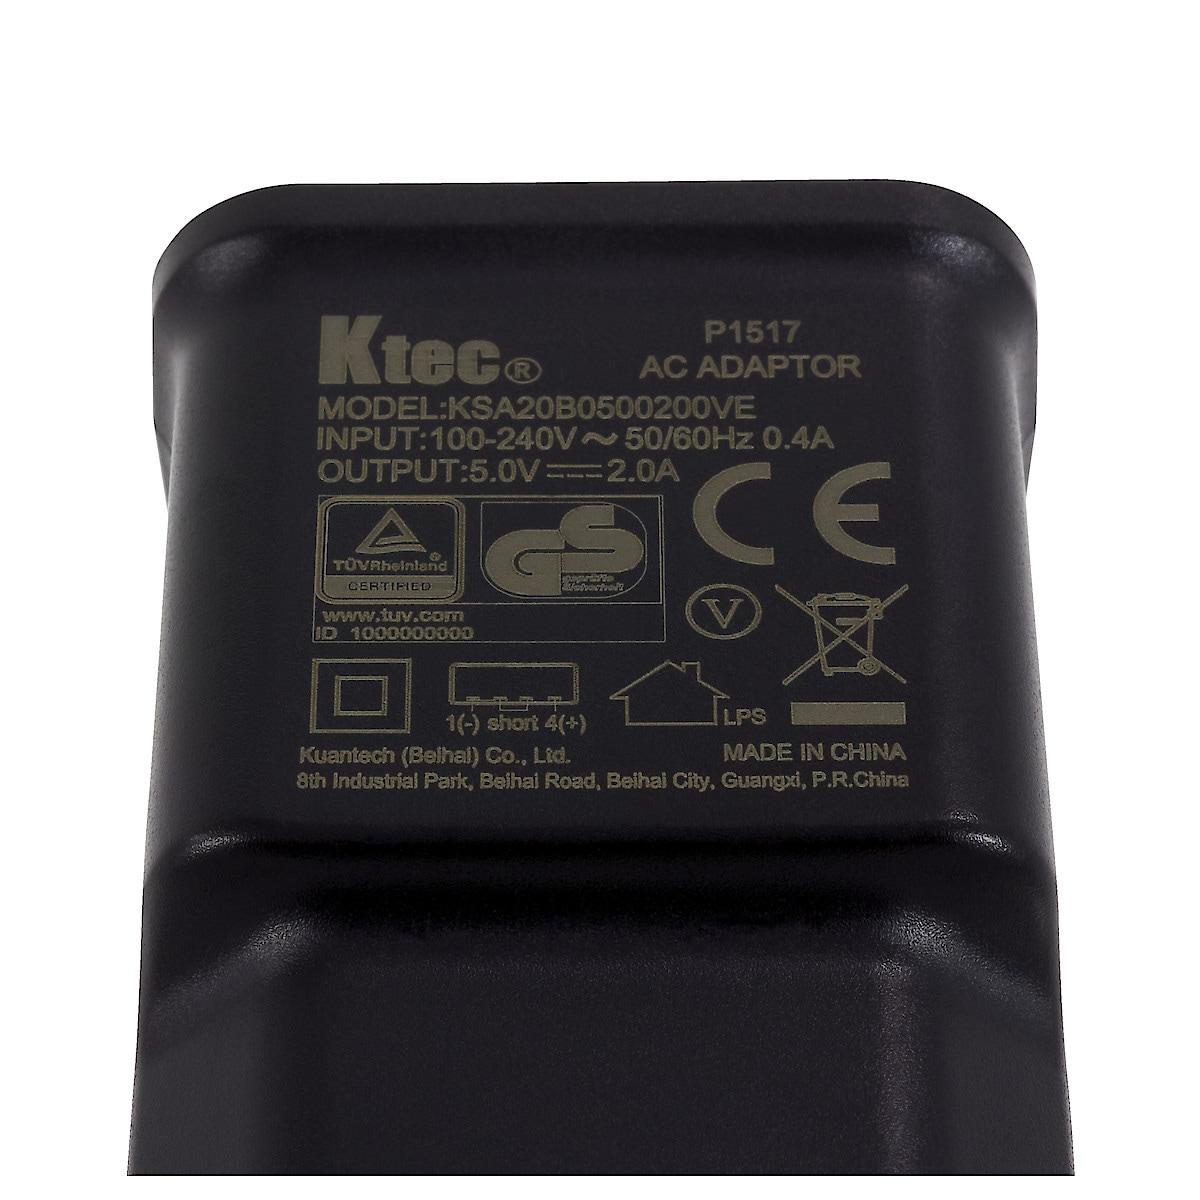 Cotech CJ-008-03, USB-lader